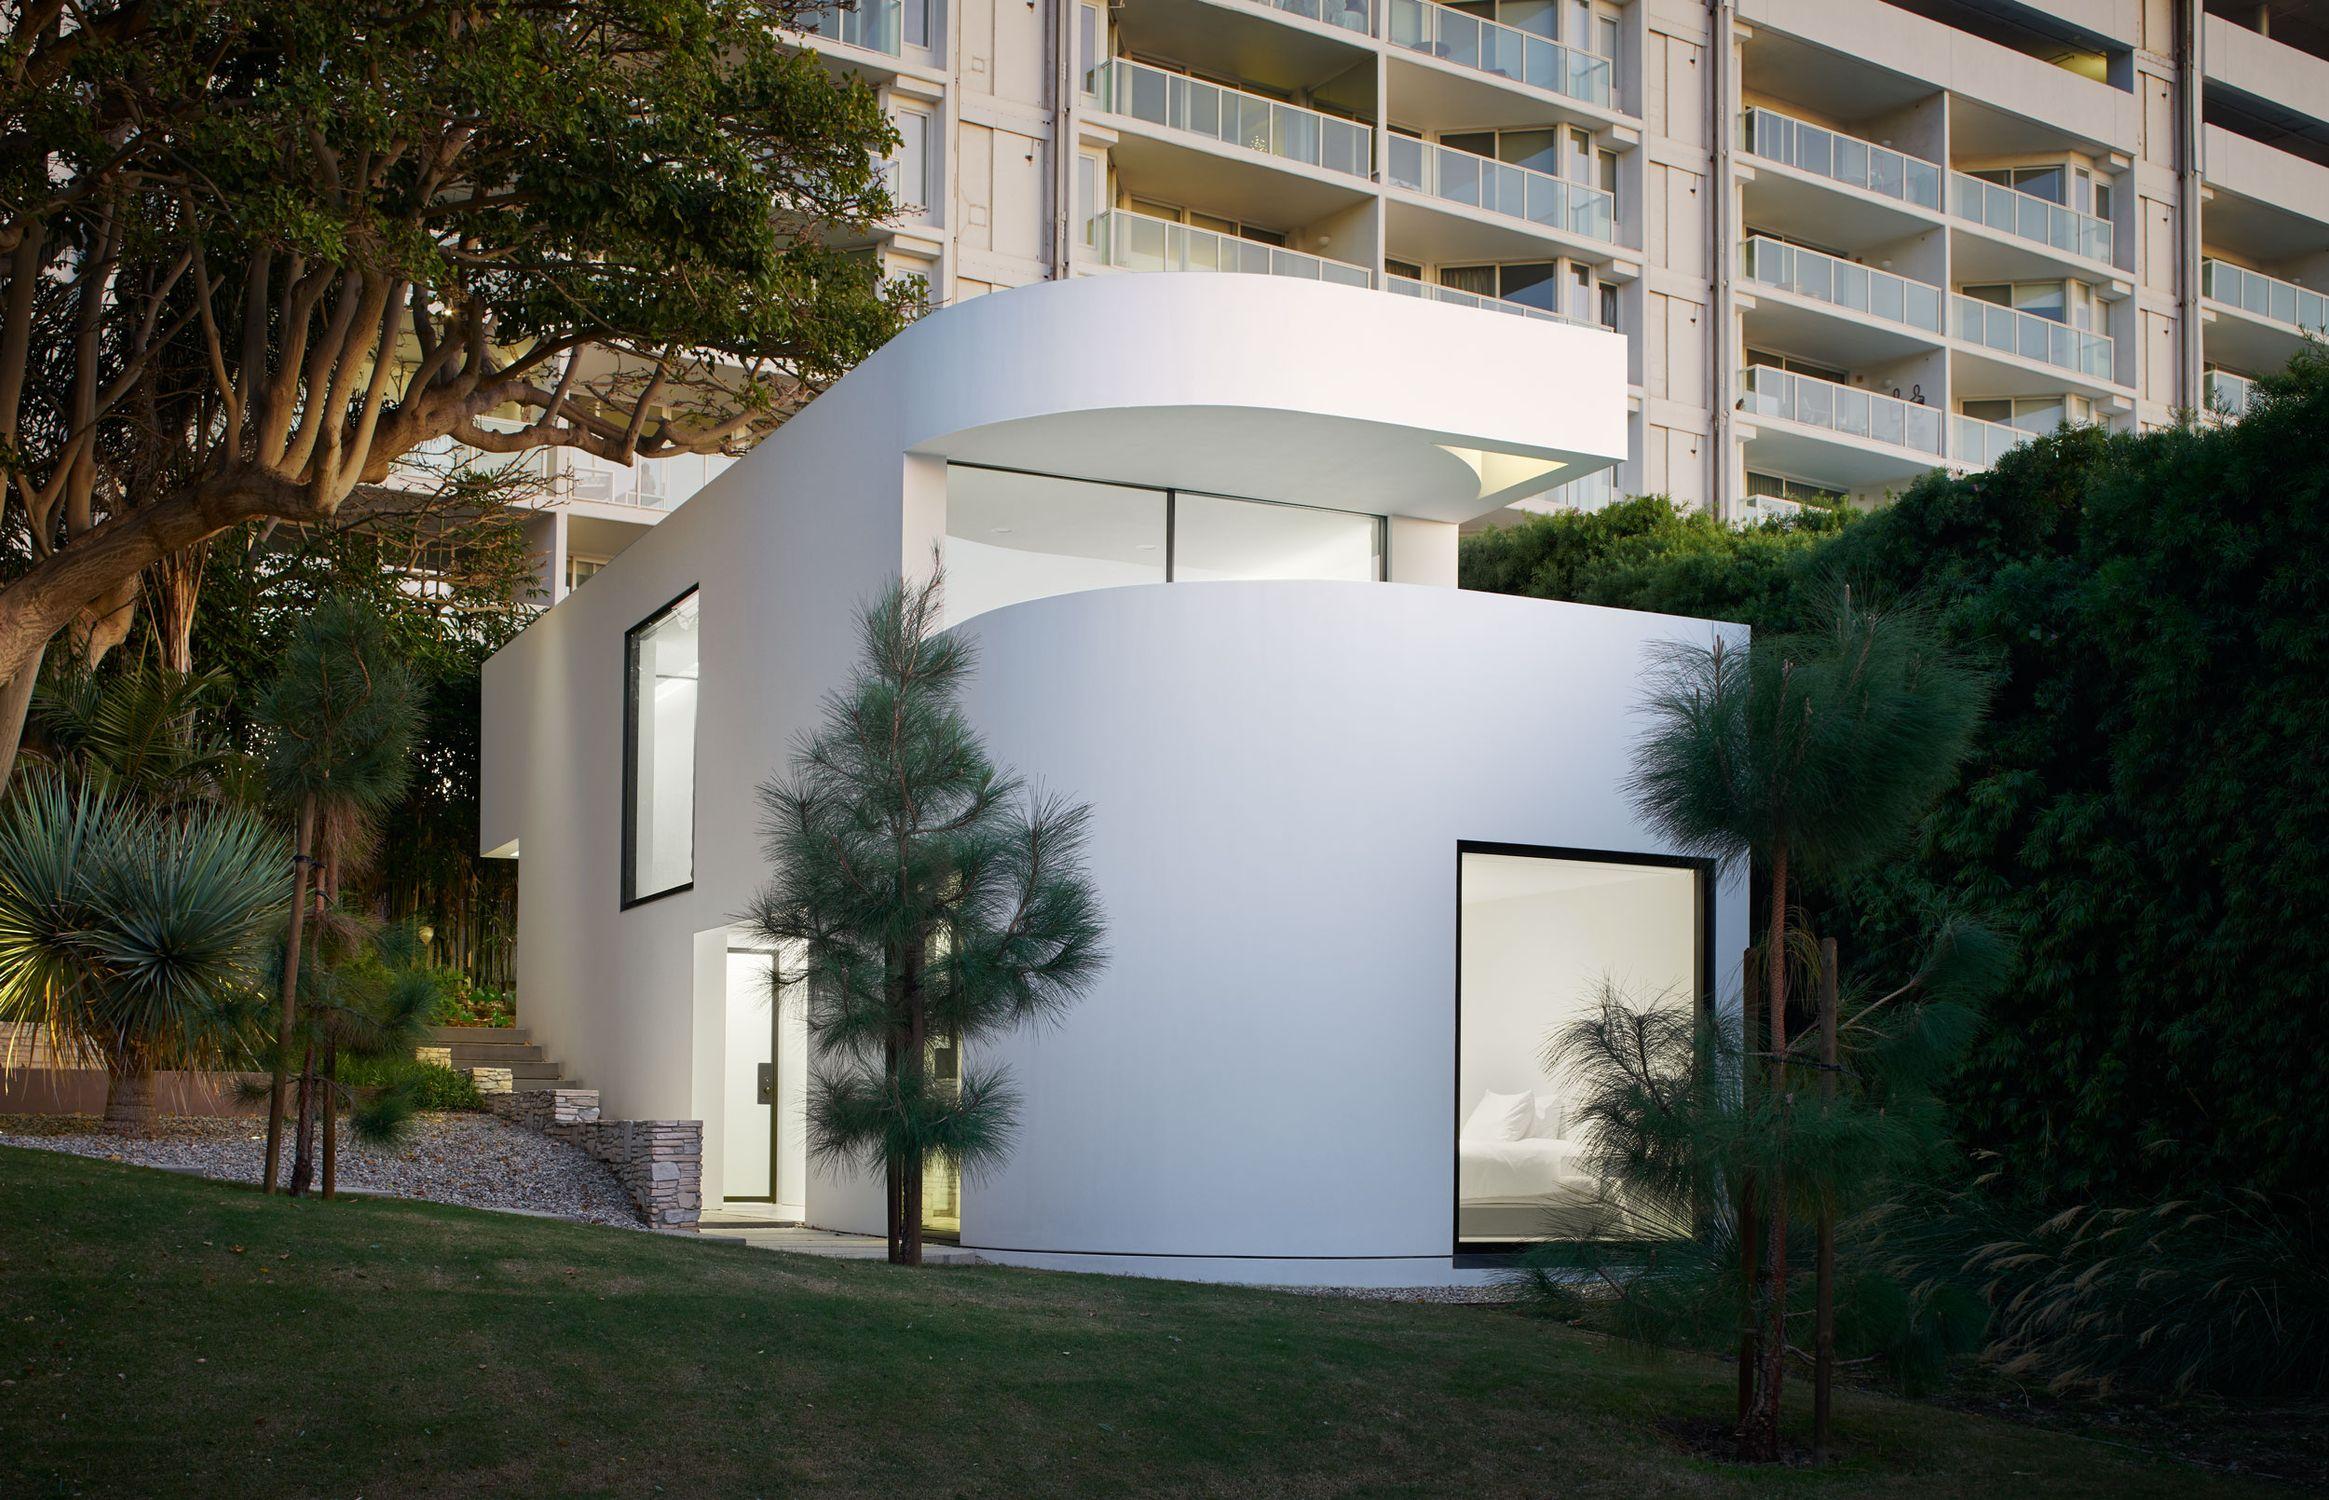 Stunning Design Projects by Johnston Marklee stunning design projects by johnston marklee Stunning Design Projects by Johnston Marklee 6b1bfe95ab4ee361f61eec56f00f0dd9845239cf 2500x1610